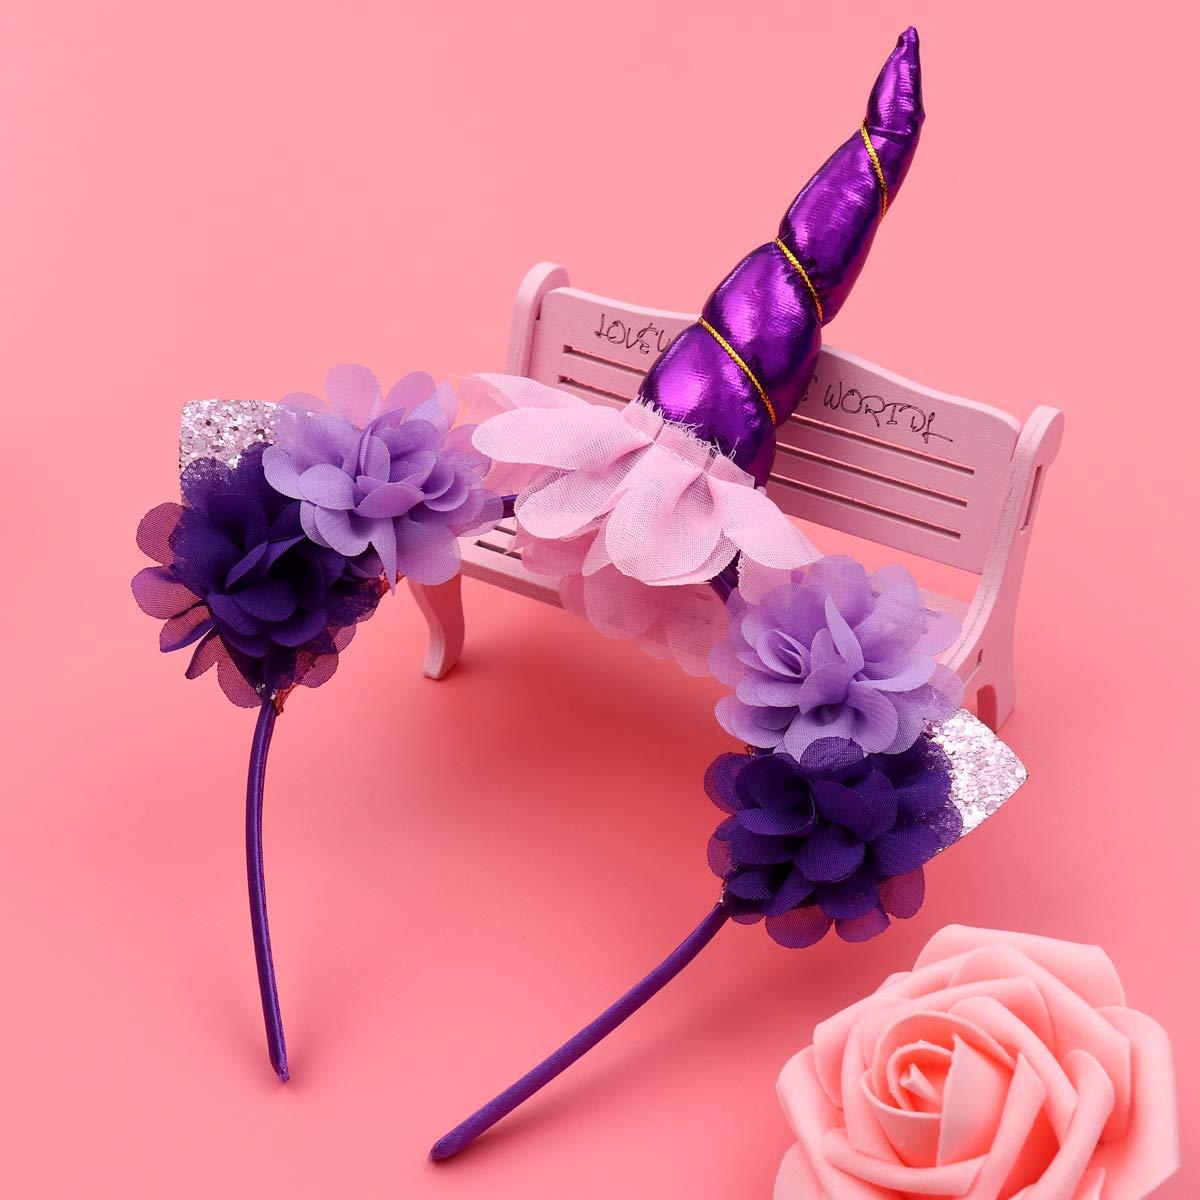 Fenical-Unicorn-Horn-Headband-Rainbow-Tutu-Skirt-Kids-Girls-Unicorn-Costume-Set-Hairband-and-SkirtPurple